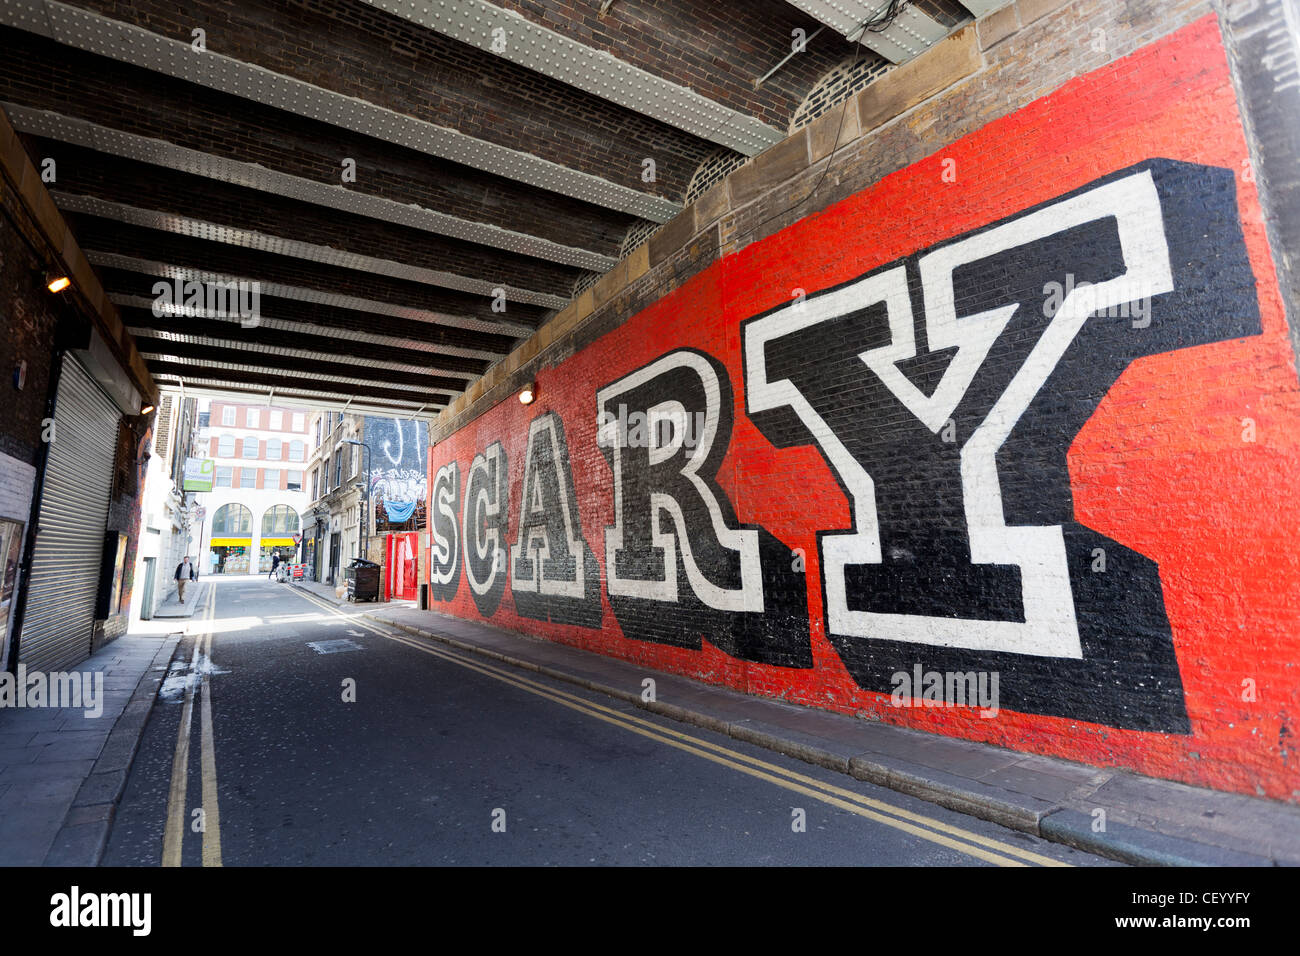 SCARY Street Art by Ben Eine, Rivington Street , Shoreditch, London, England, UK. - Stock Image